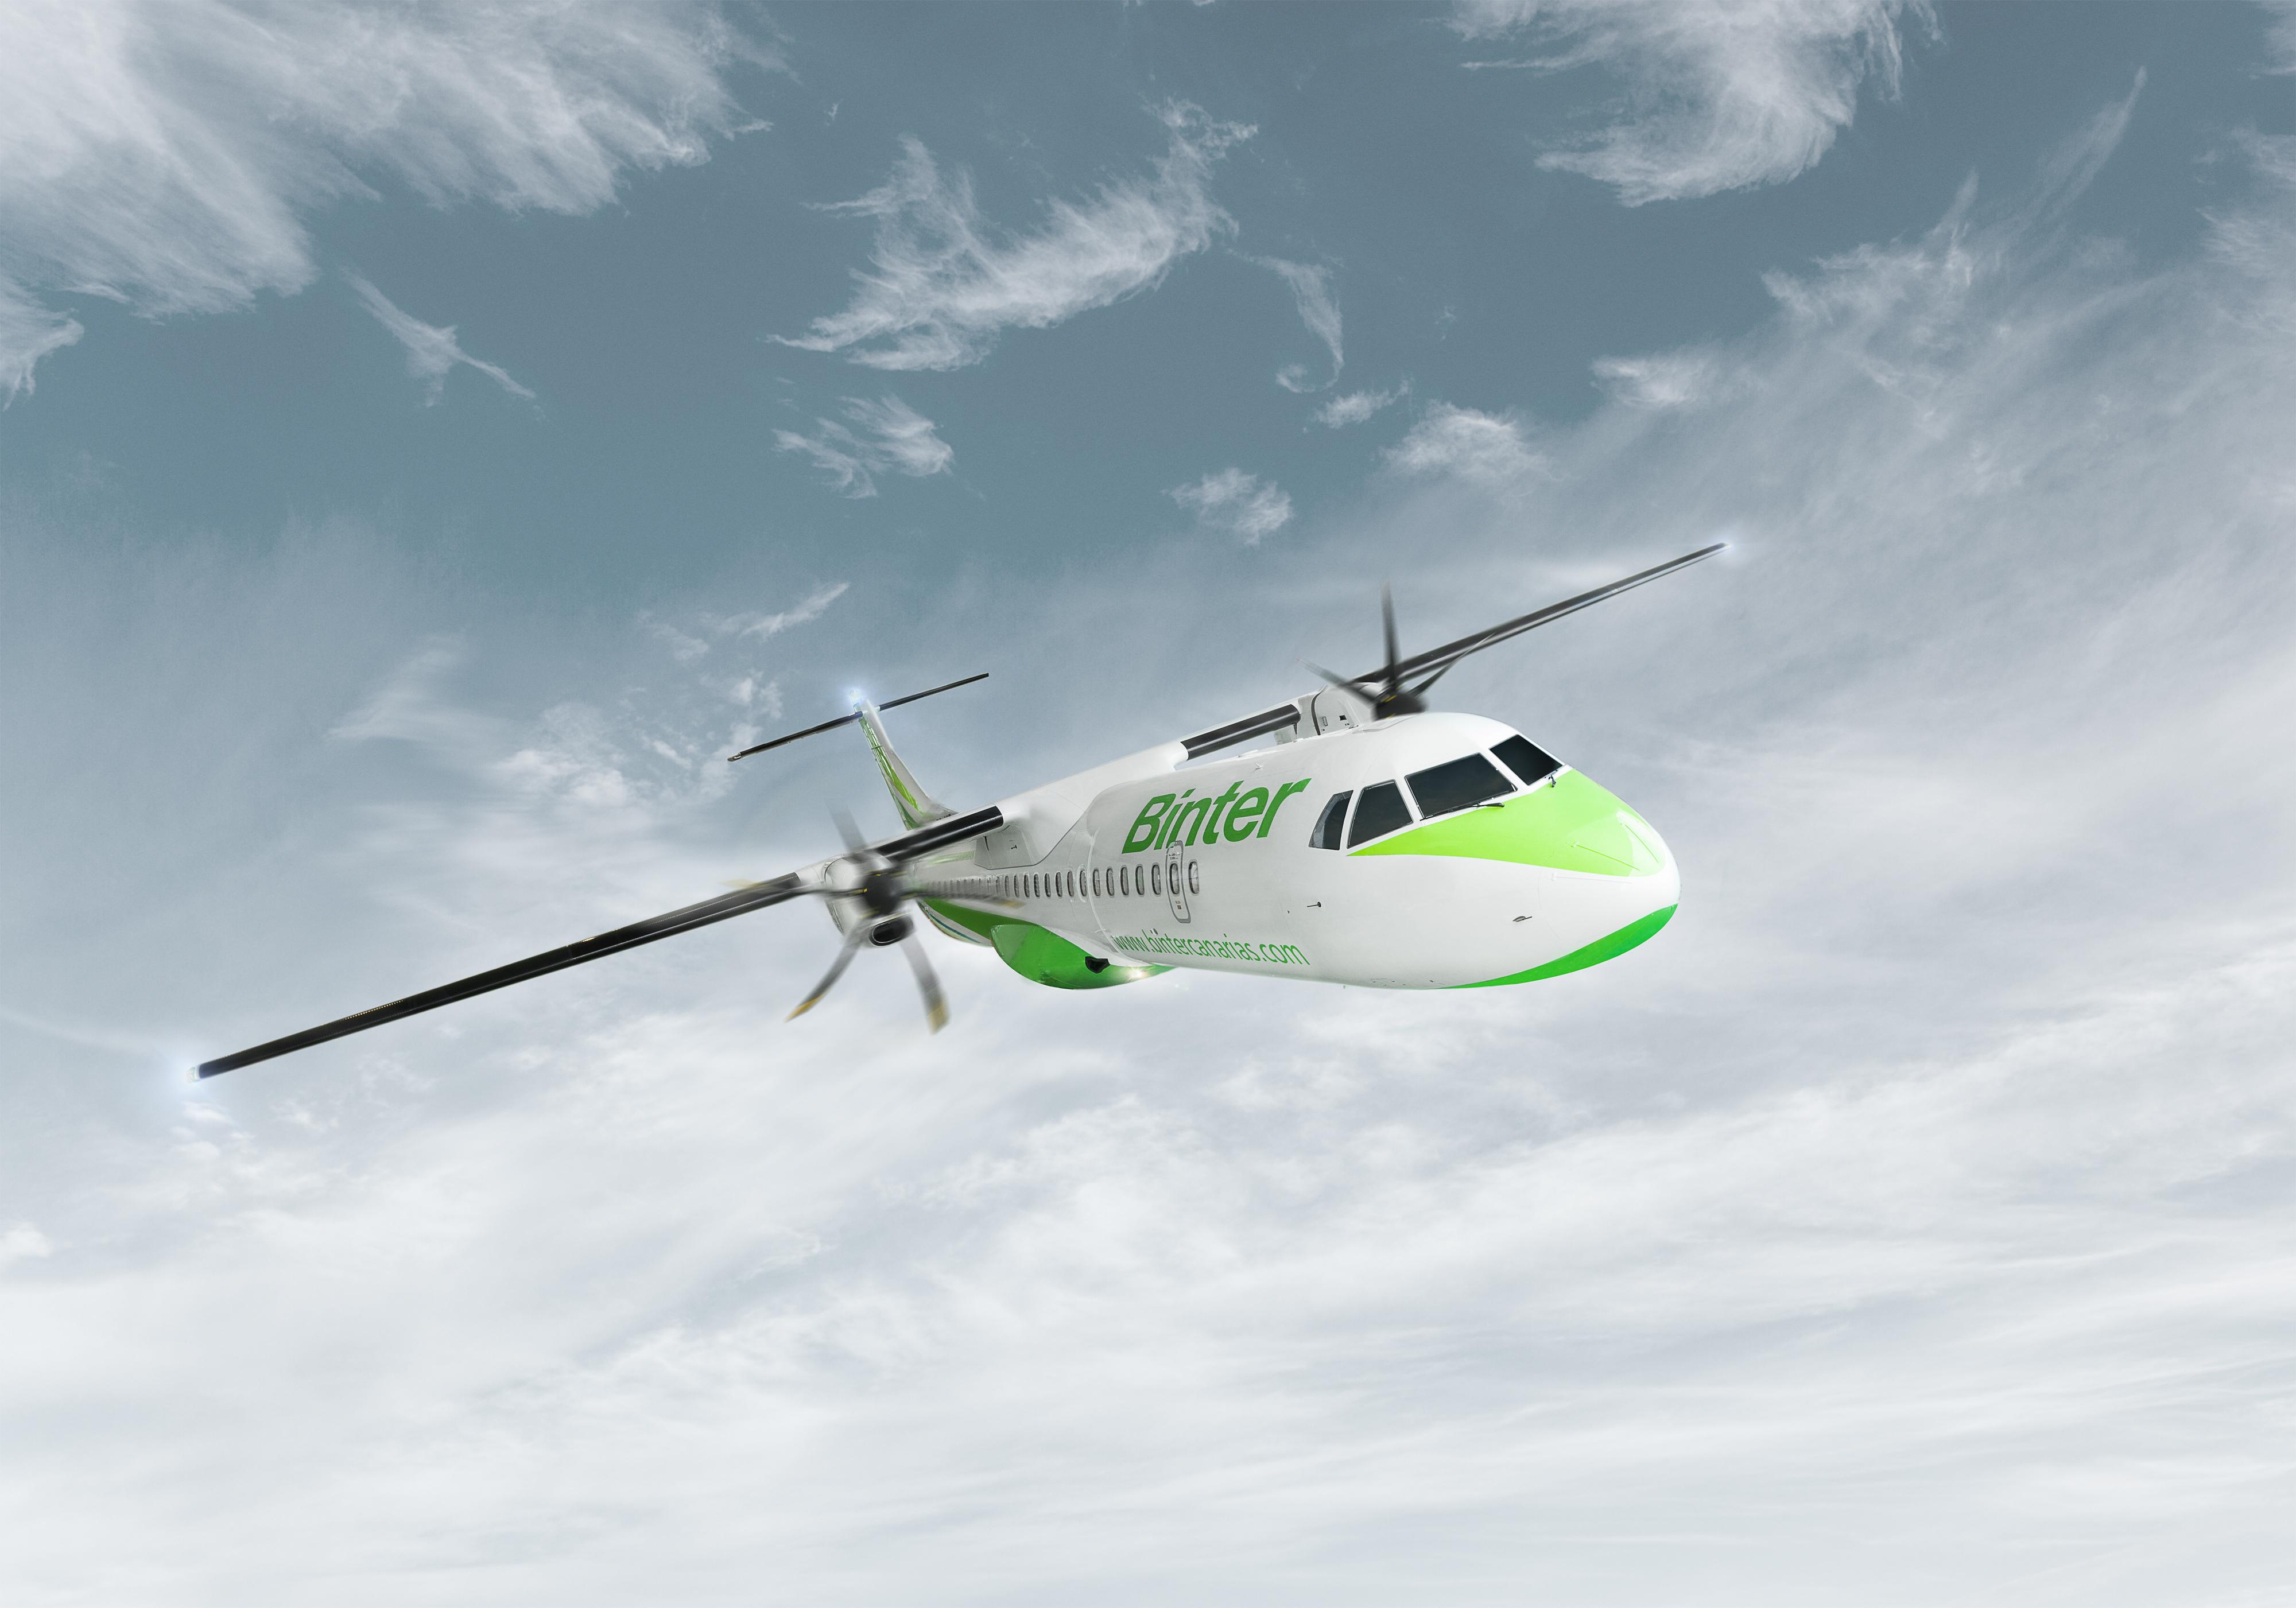 Representacion de un avión Binter en vuelo